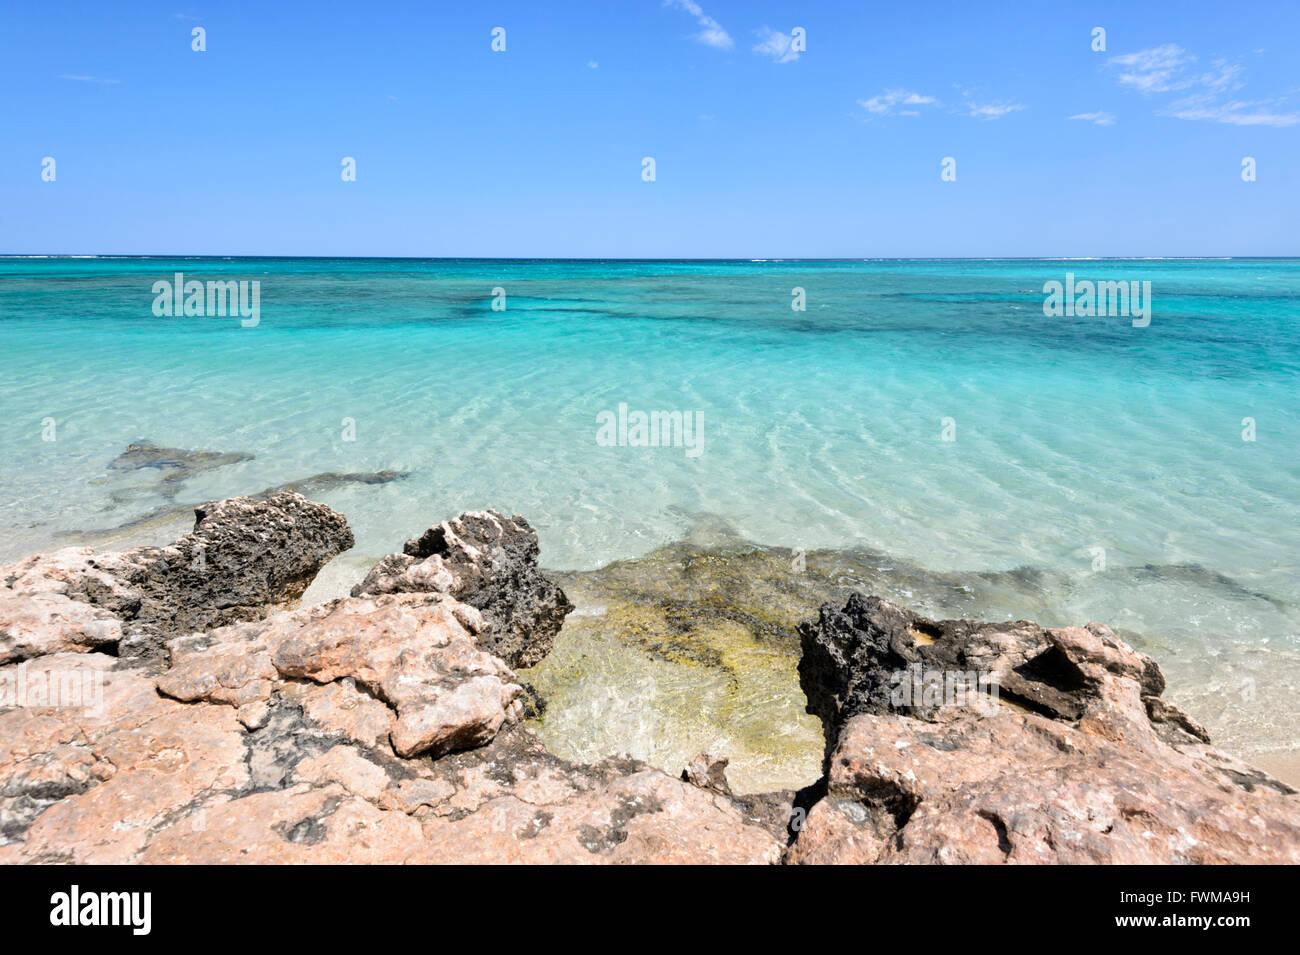 La côte de Ningaloo, patrimoine mondial, Western Australia, Australia Photo Stock